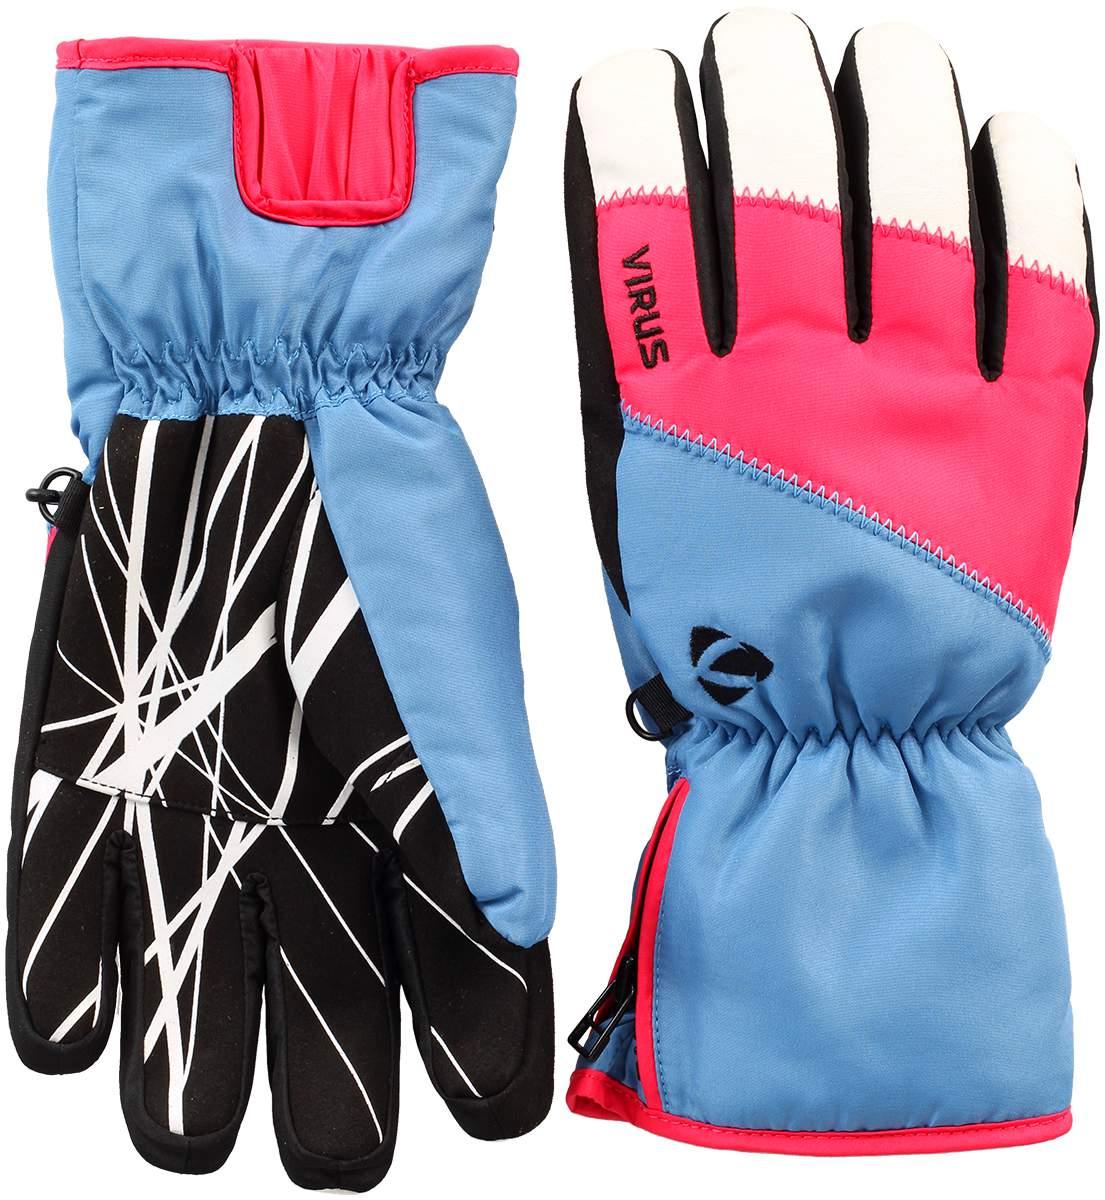 Перчатки Trail W женскиеПерчатки<br><br><br>Цвет: Голубой<br>Размер: XL